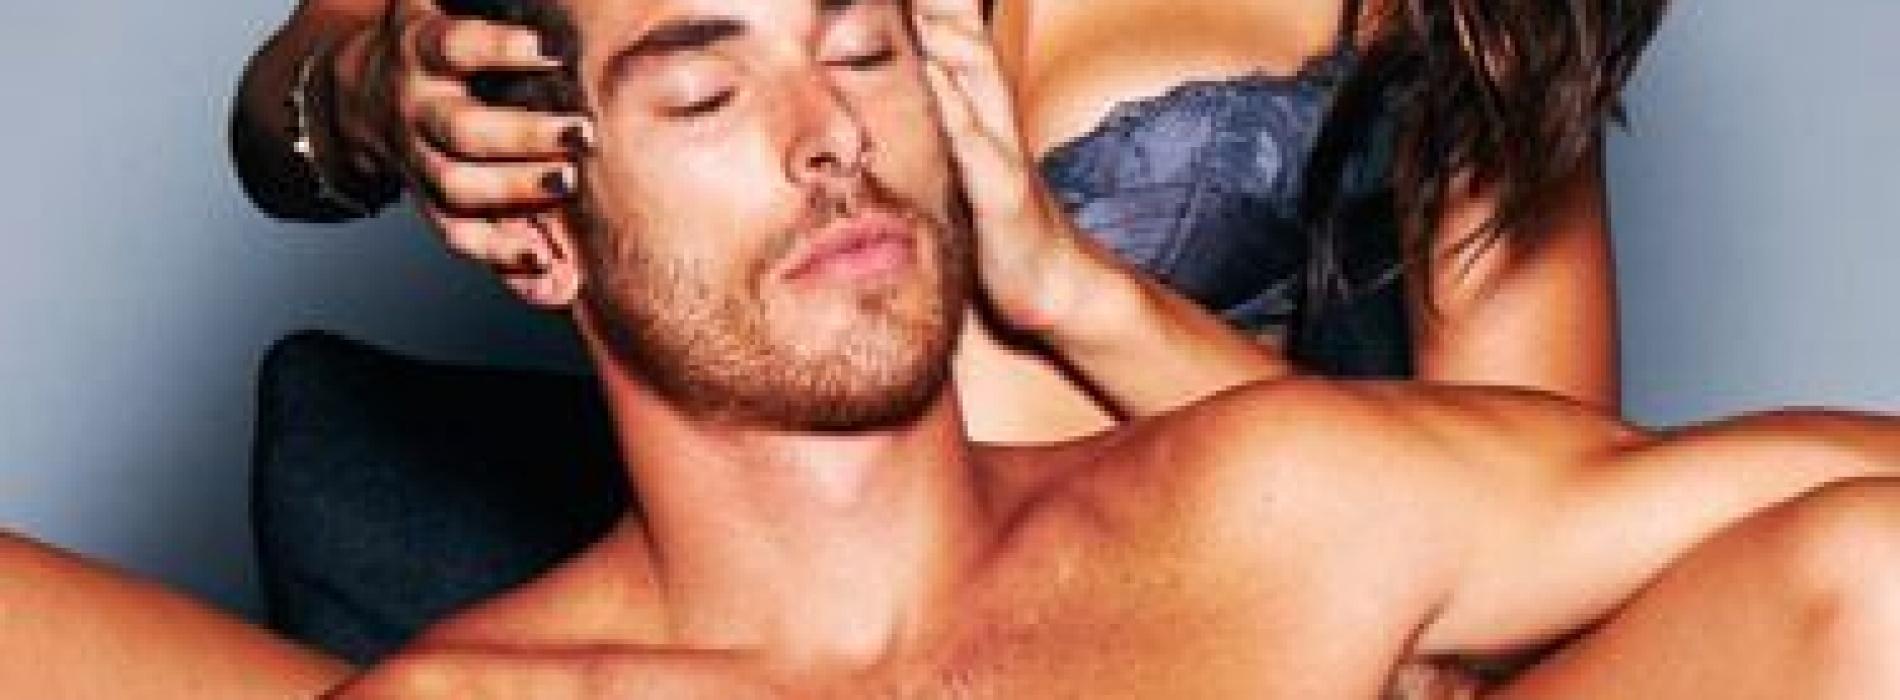 filmpje erotische massage top 10 sexsites